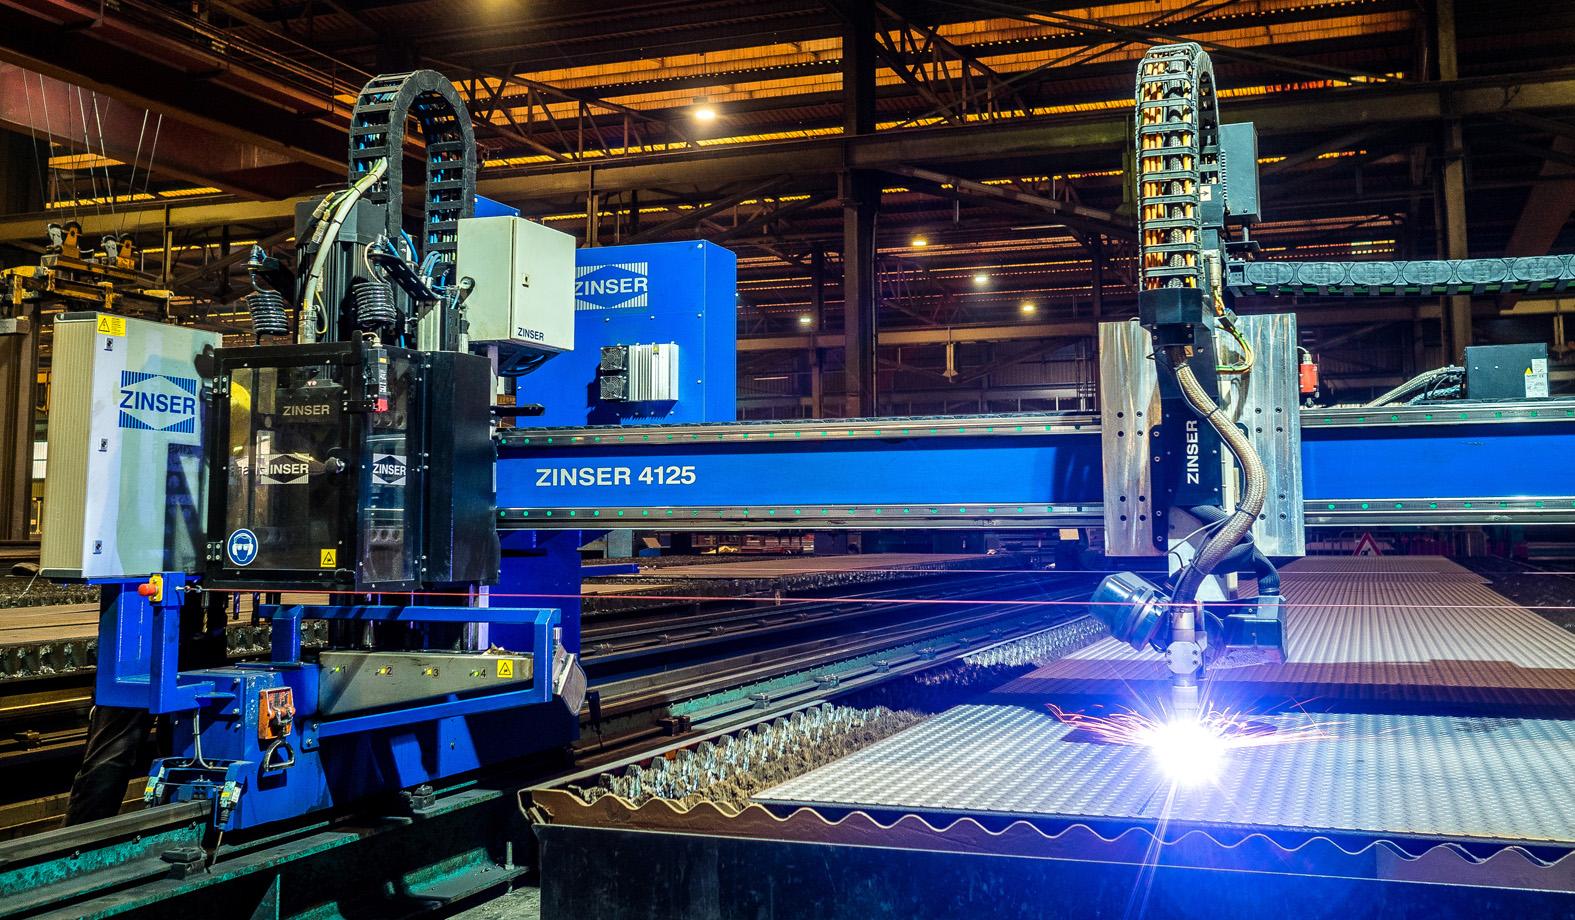 ZINSER cutting machine 4125 for plasma cutting, bevel cutting and drilling